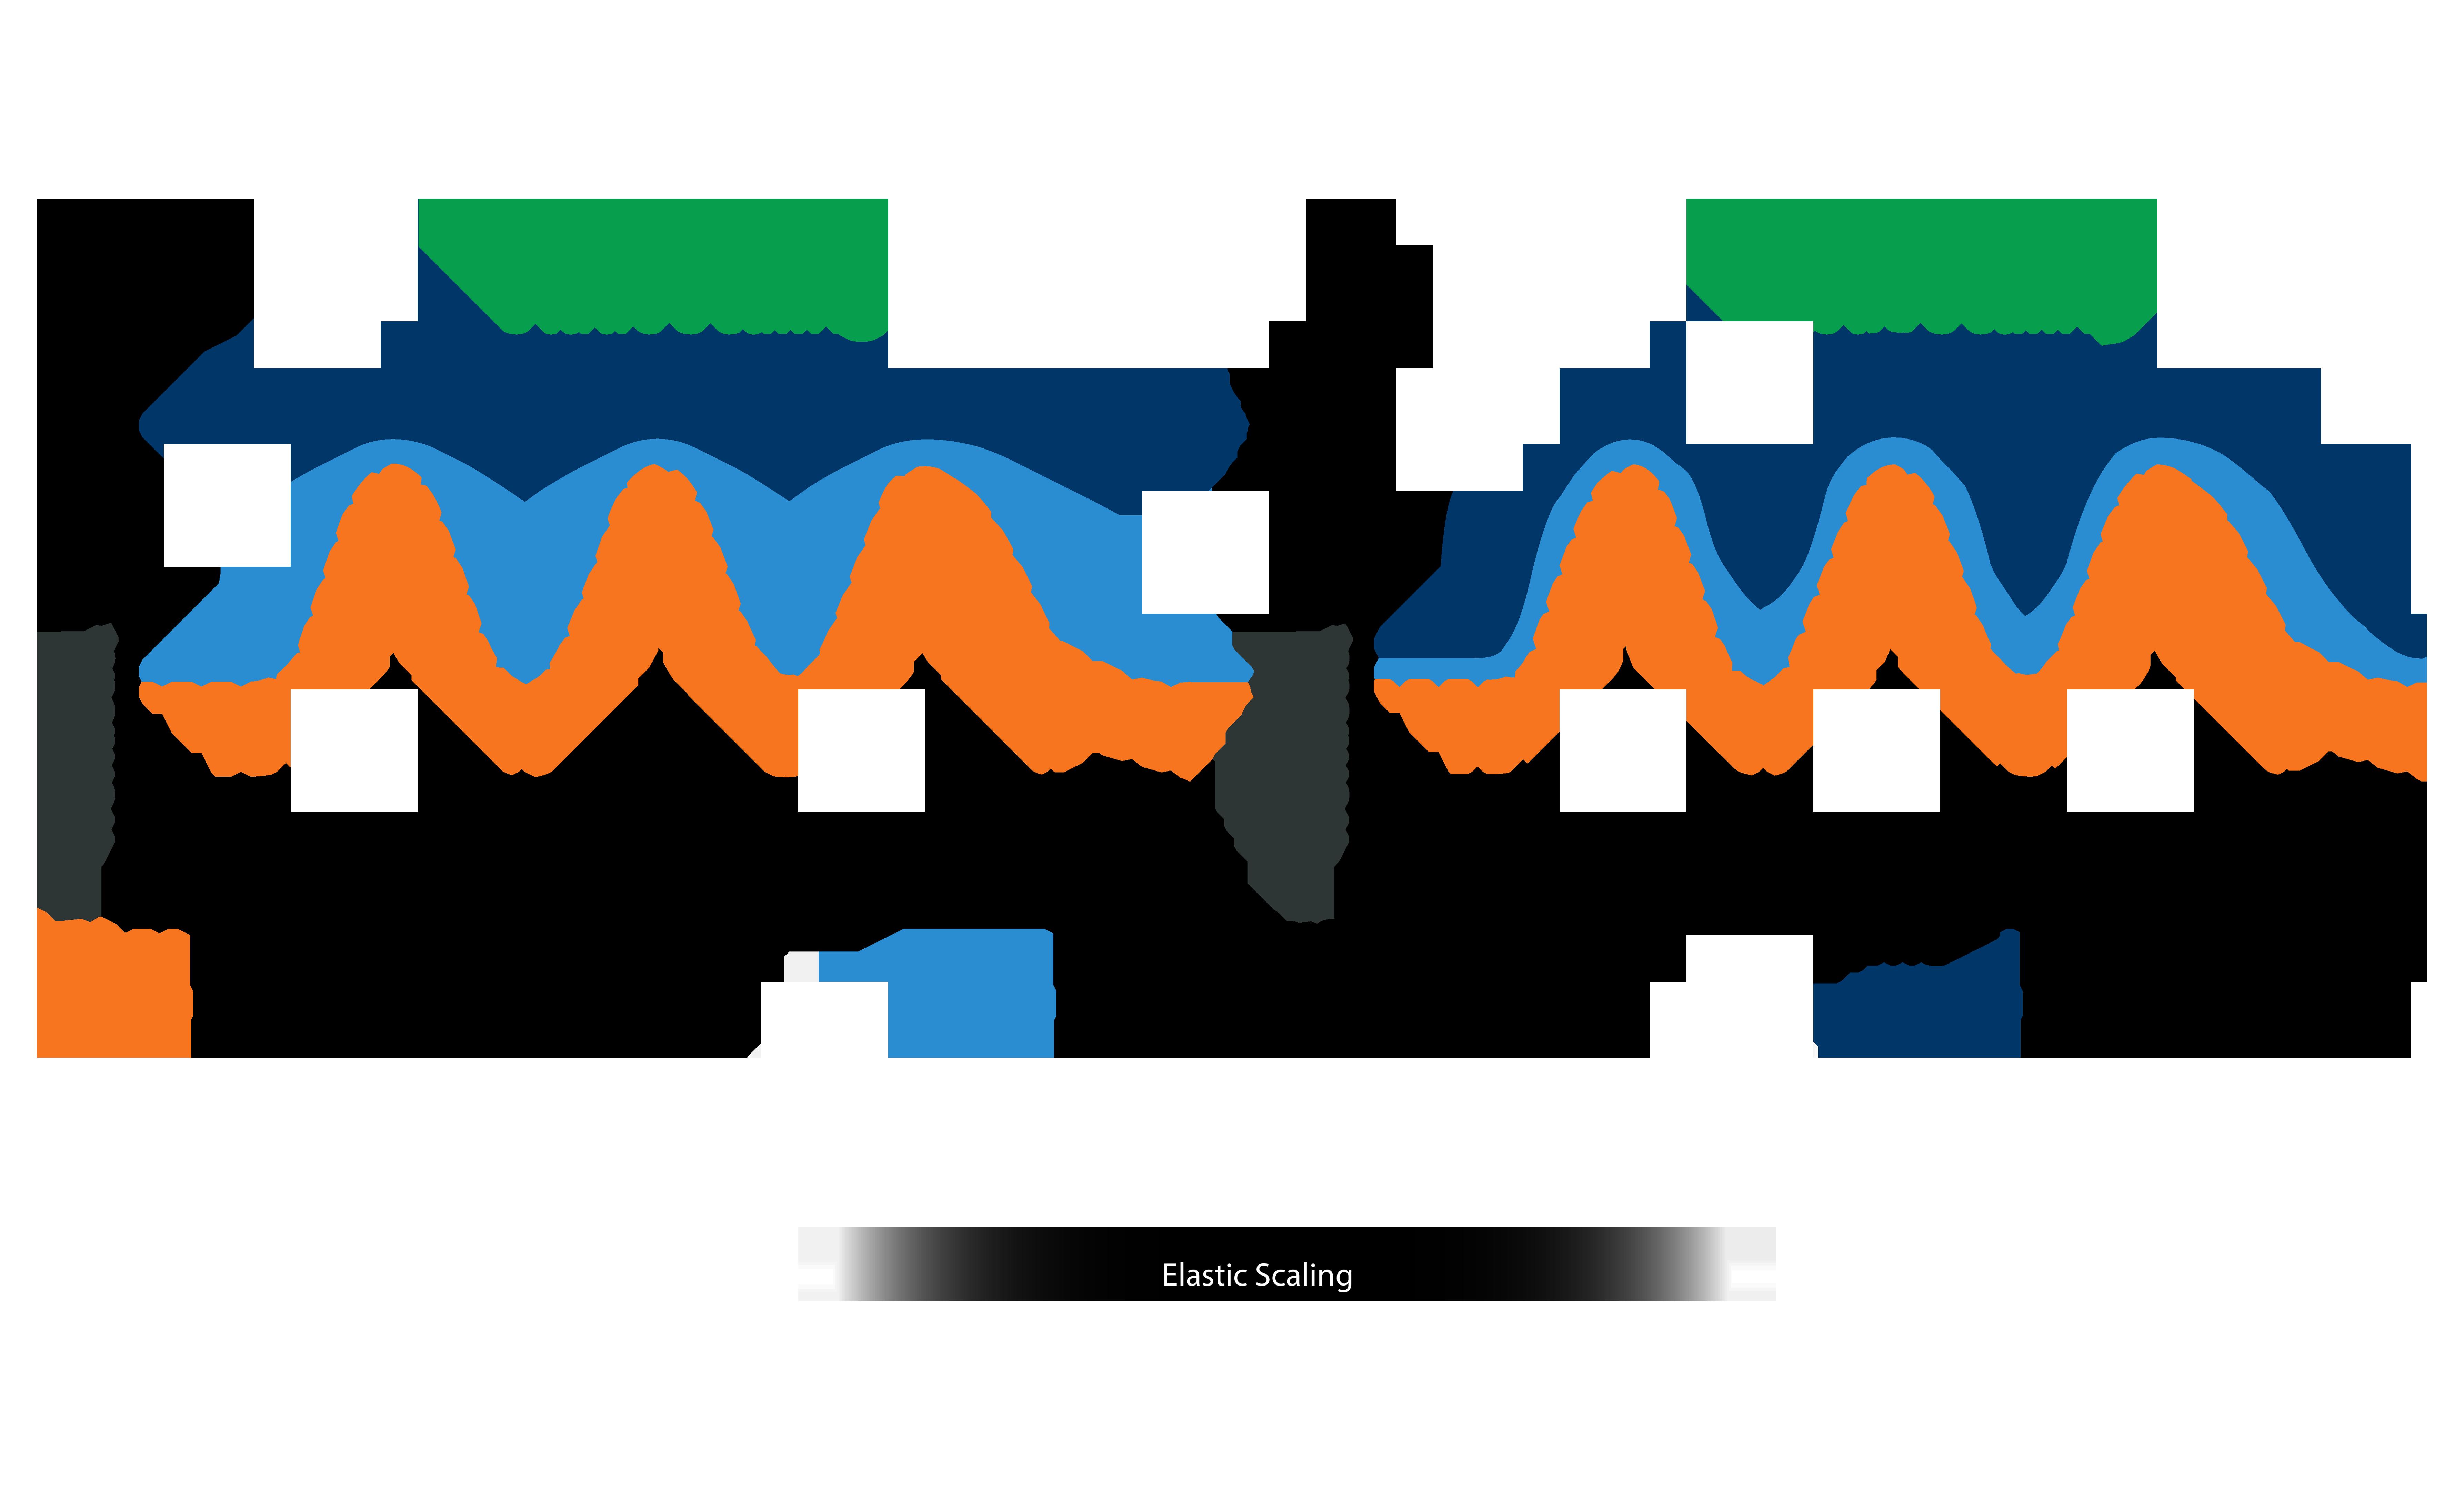 Figure-3, Elastic Scaling